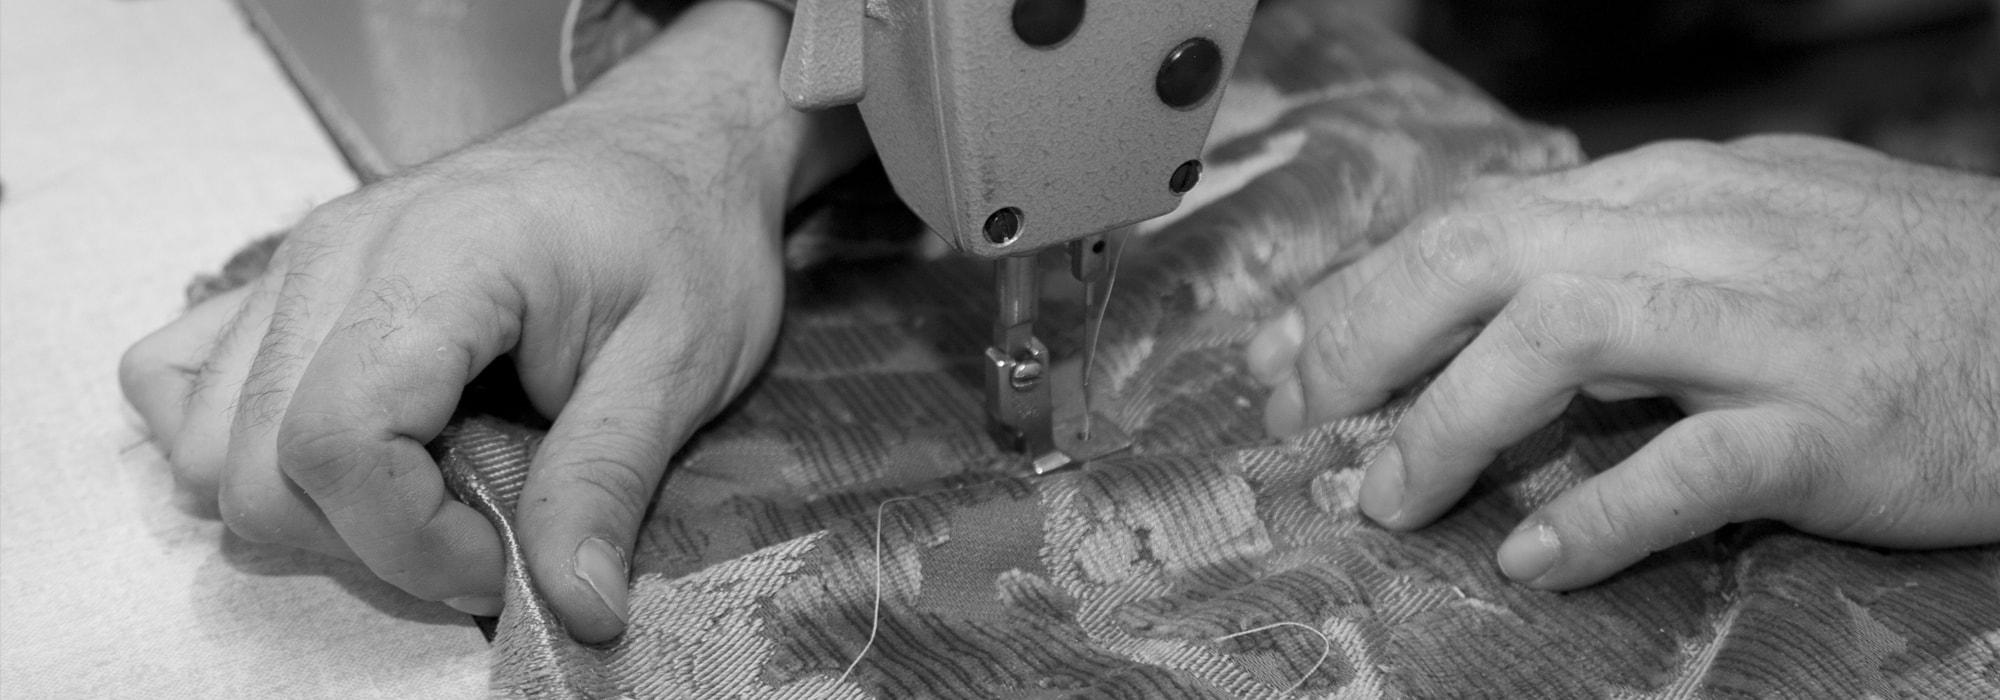 sewing-min.jpg